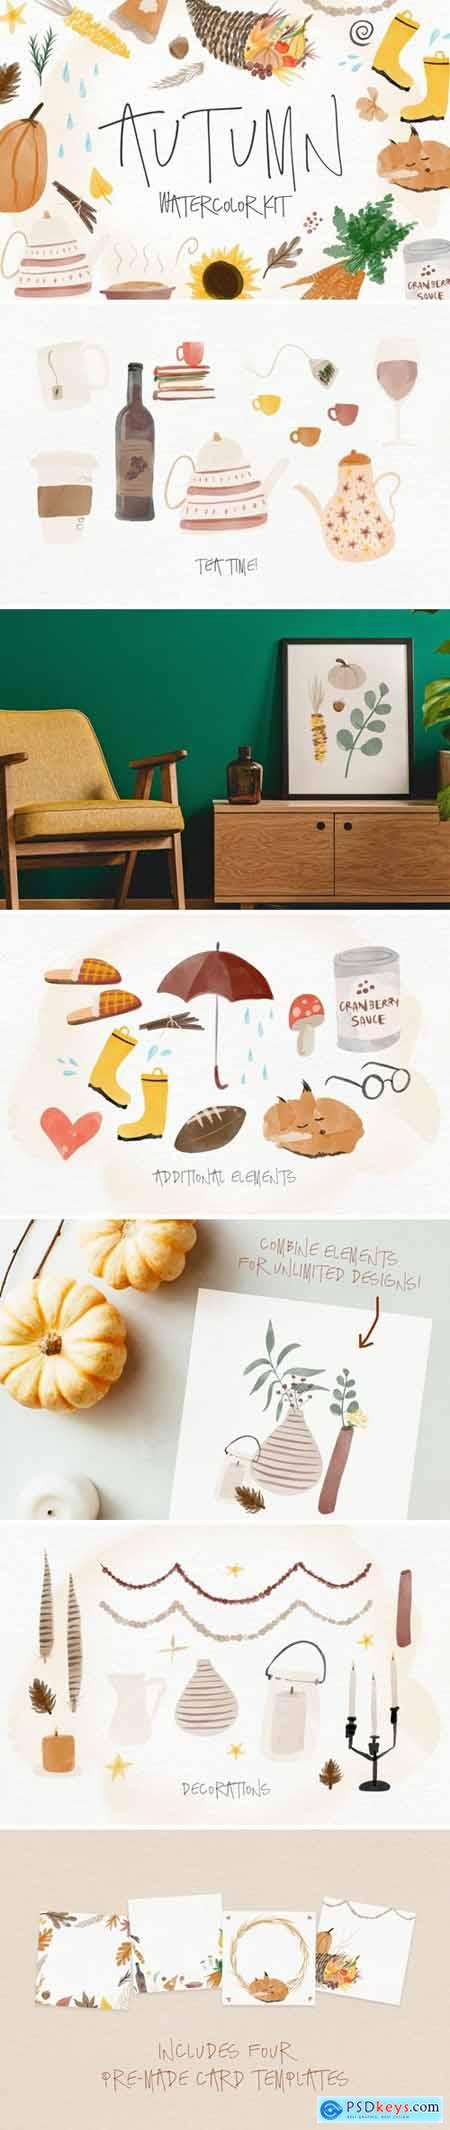 Autumn Watercolor Kit 4164444